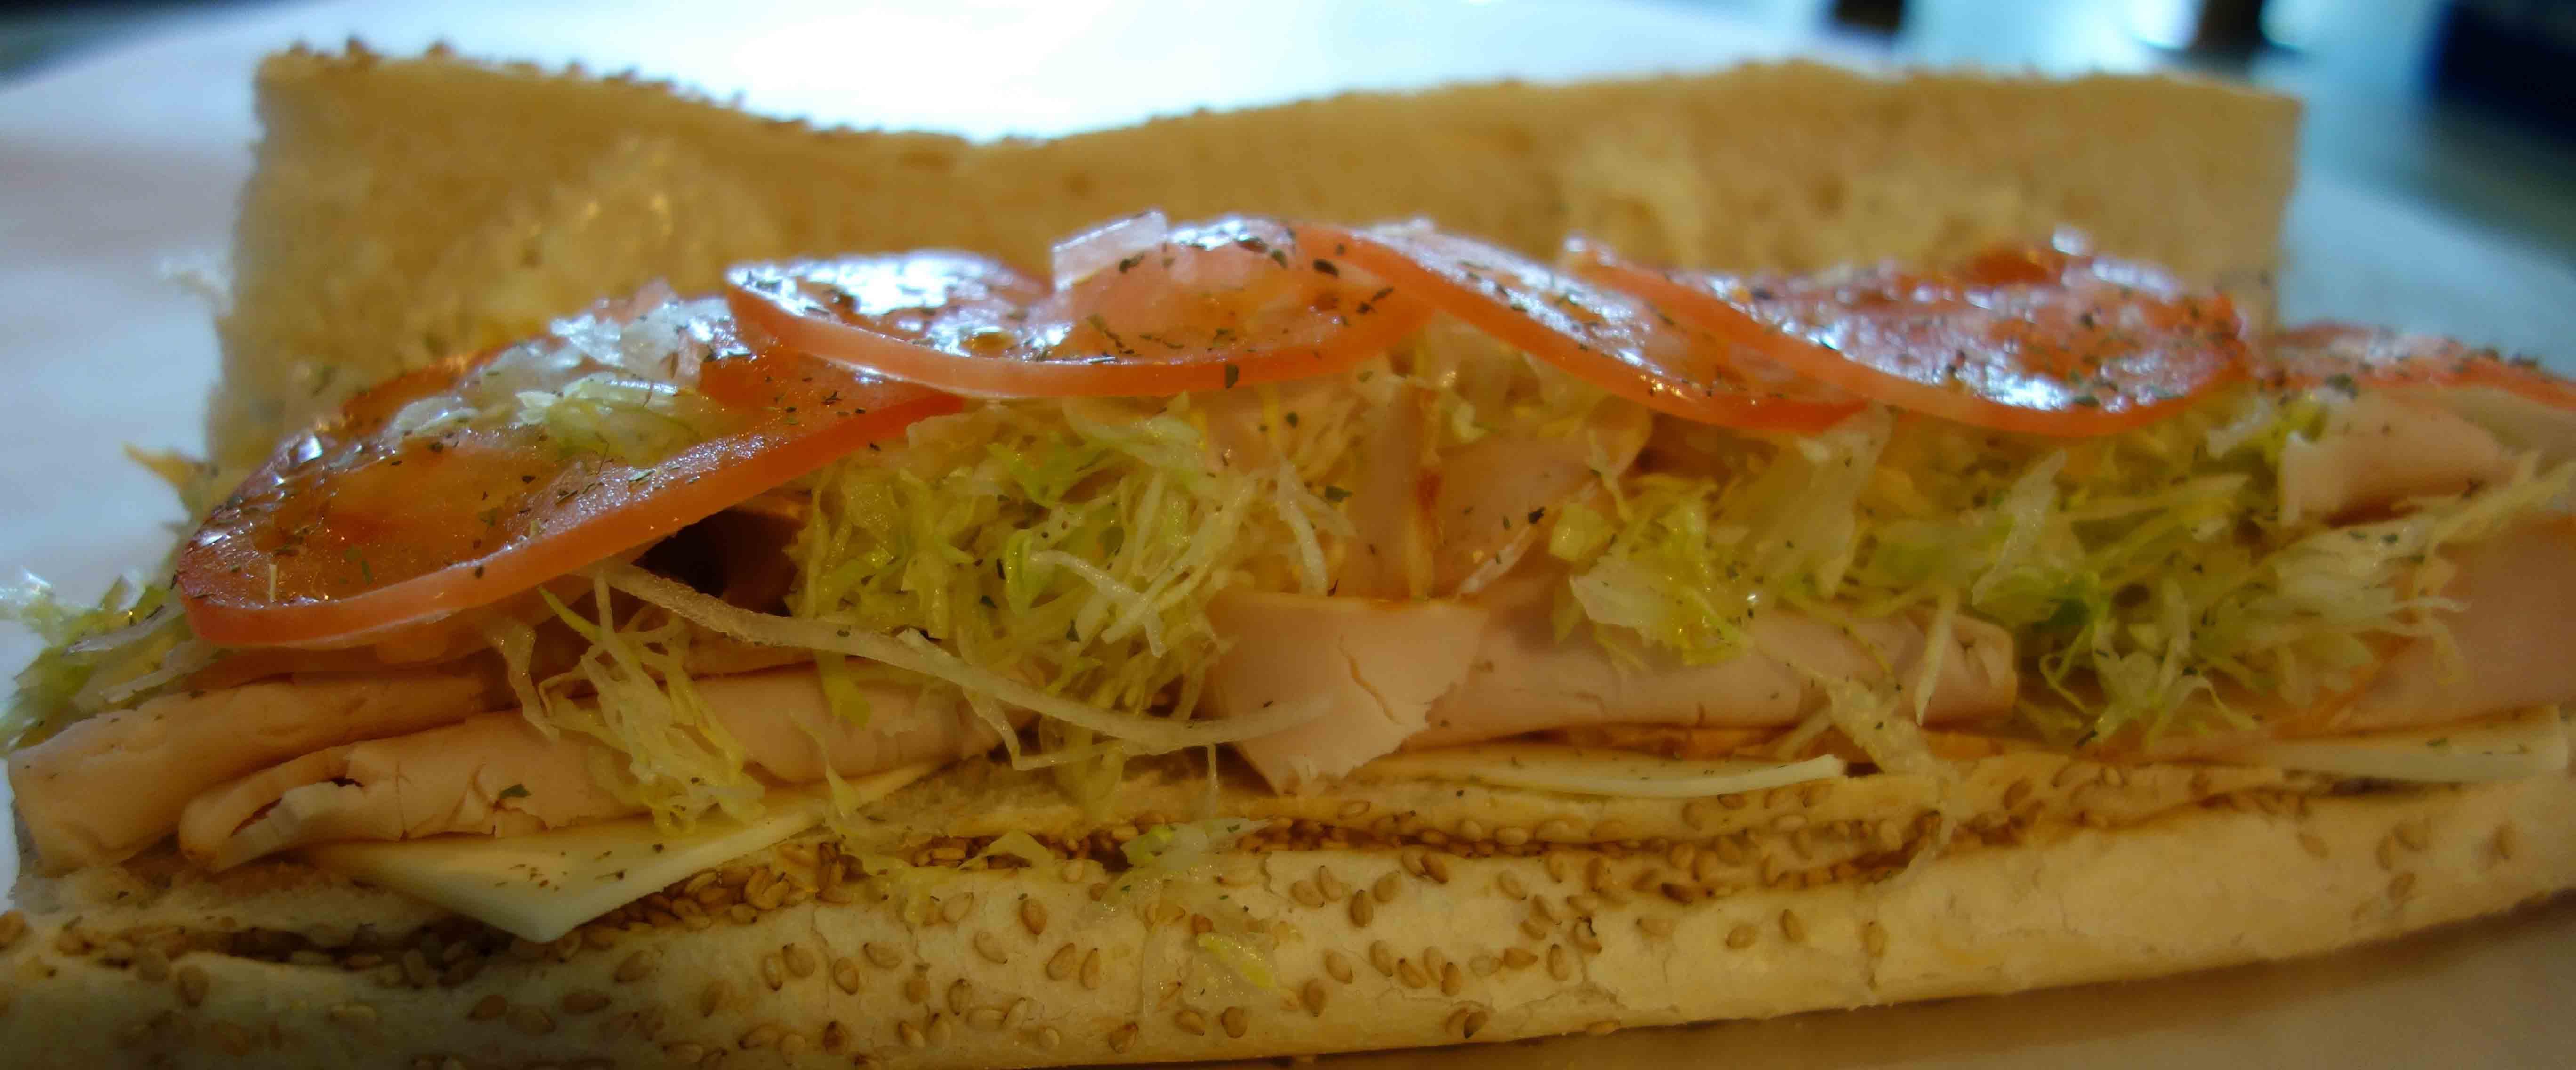 Turkey Sandwich 01